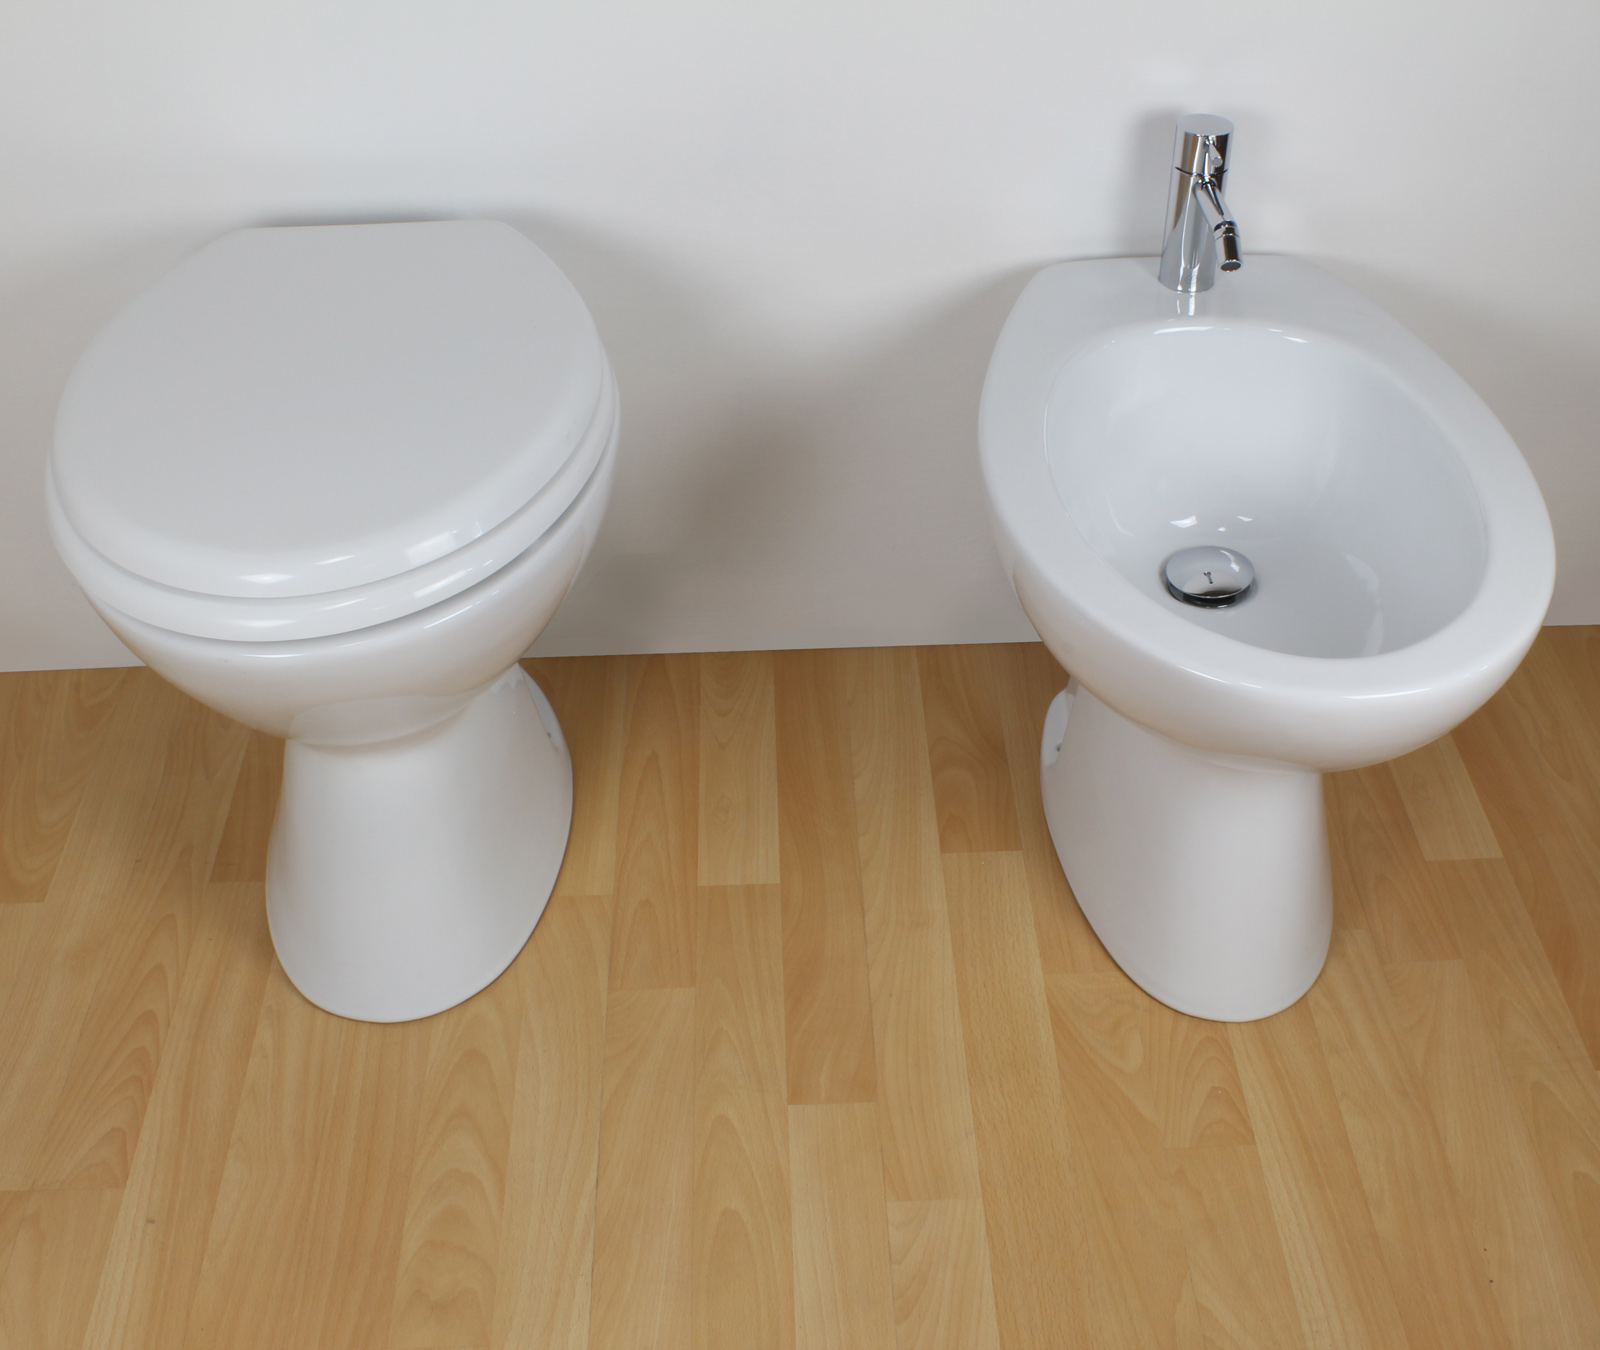 Sanitari bagno low cost iseo - Rubinetteria bagno offerte ...